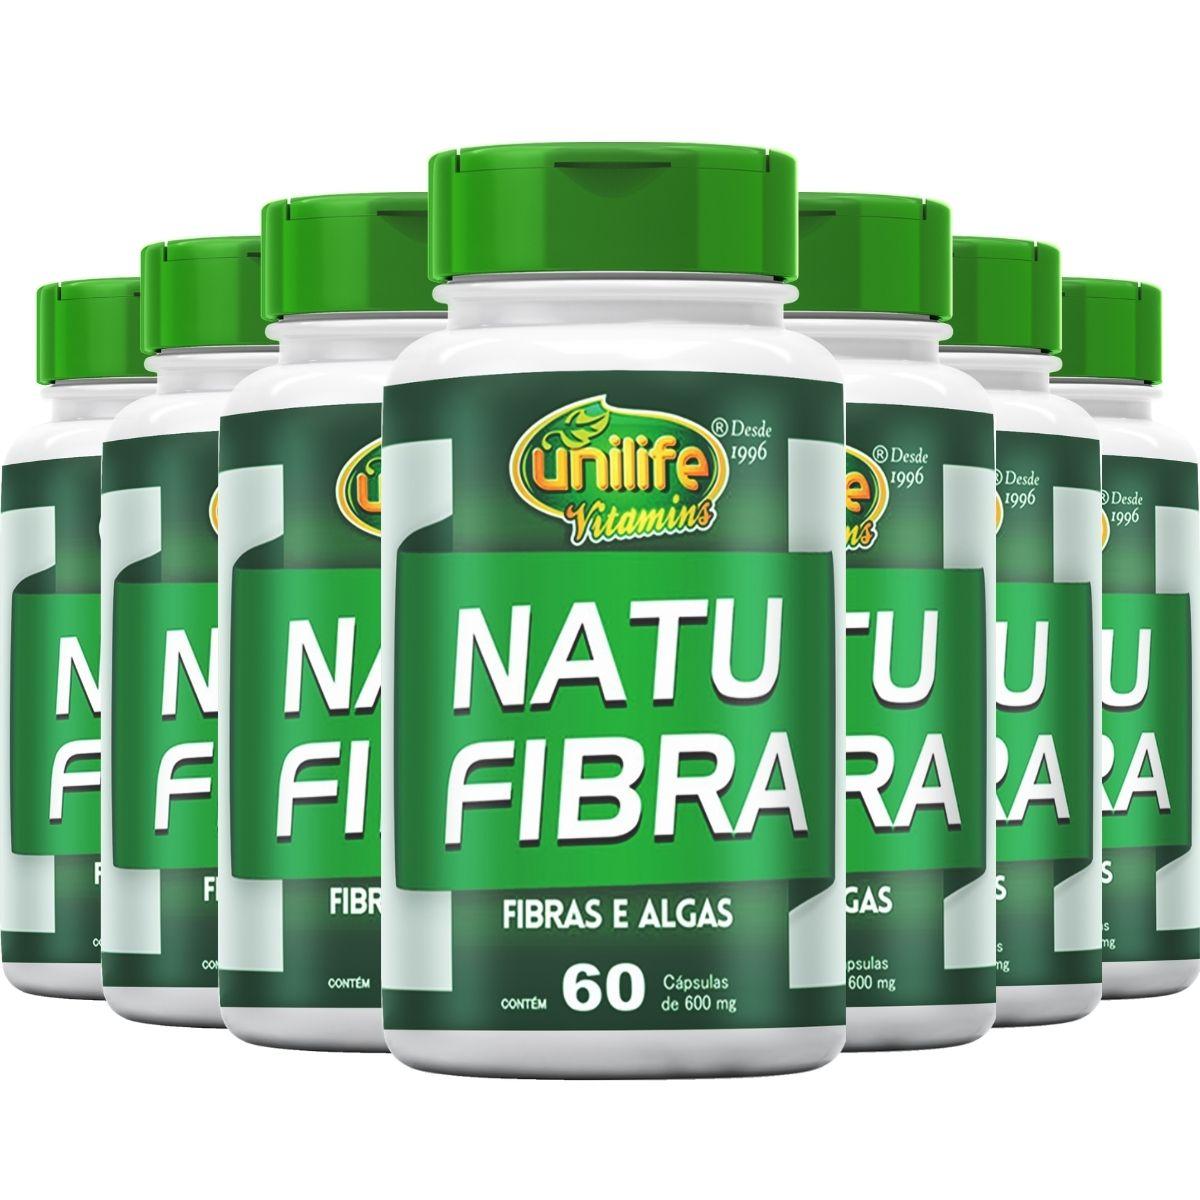 Kit 7 Natu Fibra Unilife Fibras e Algas - 600 Mg 60 cápsulas